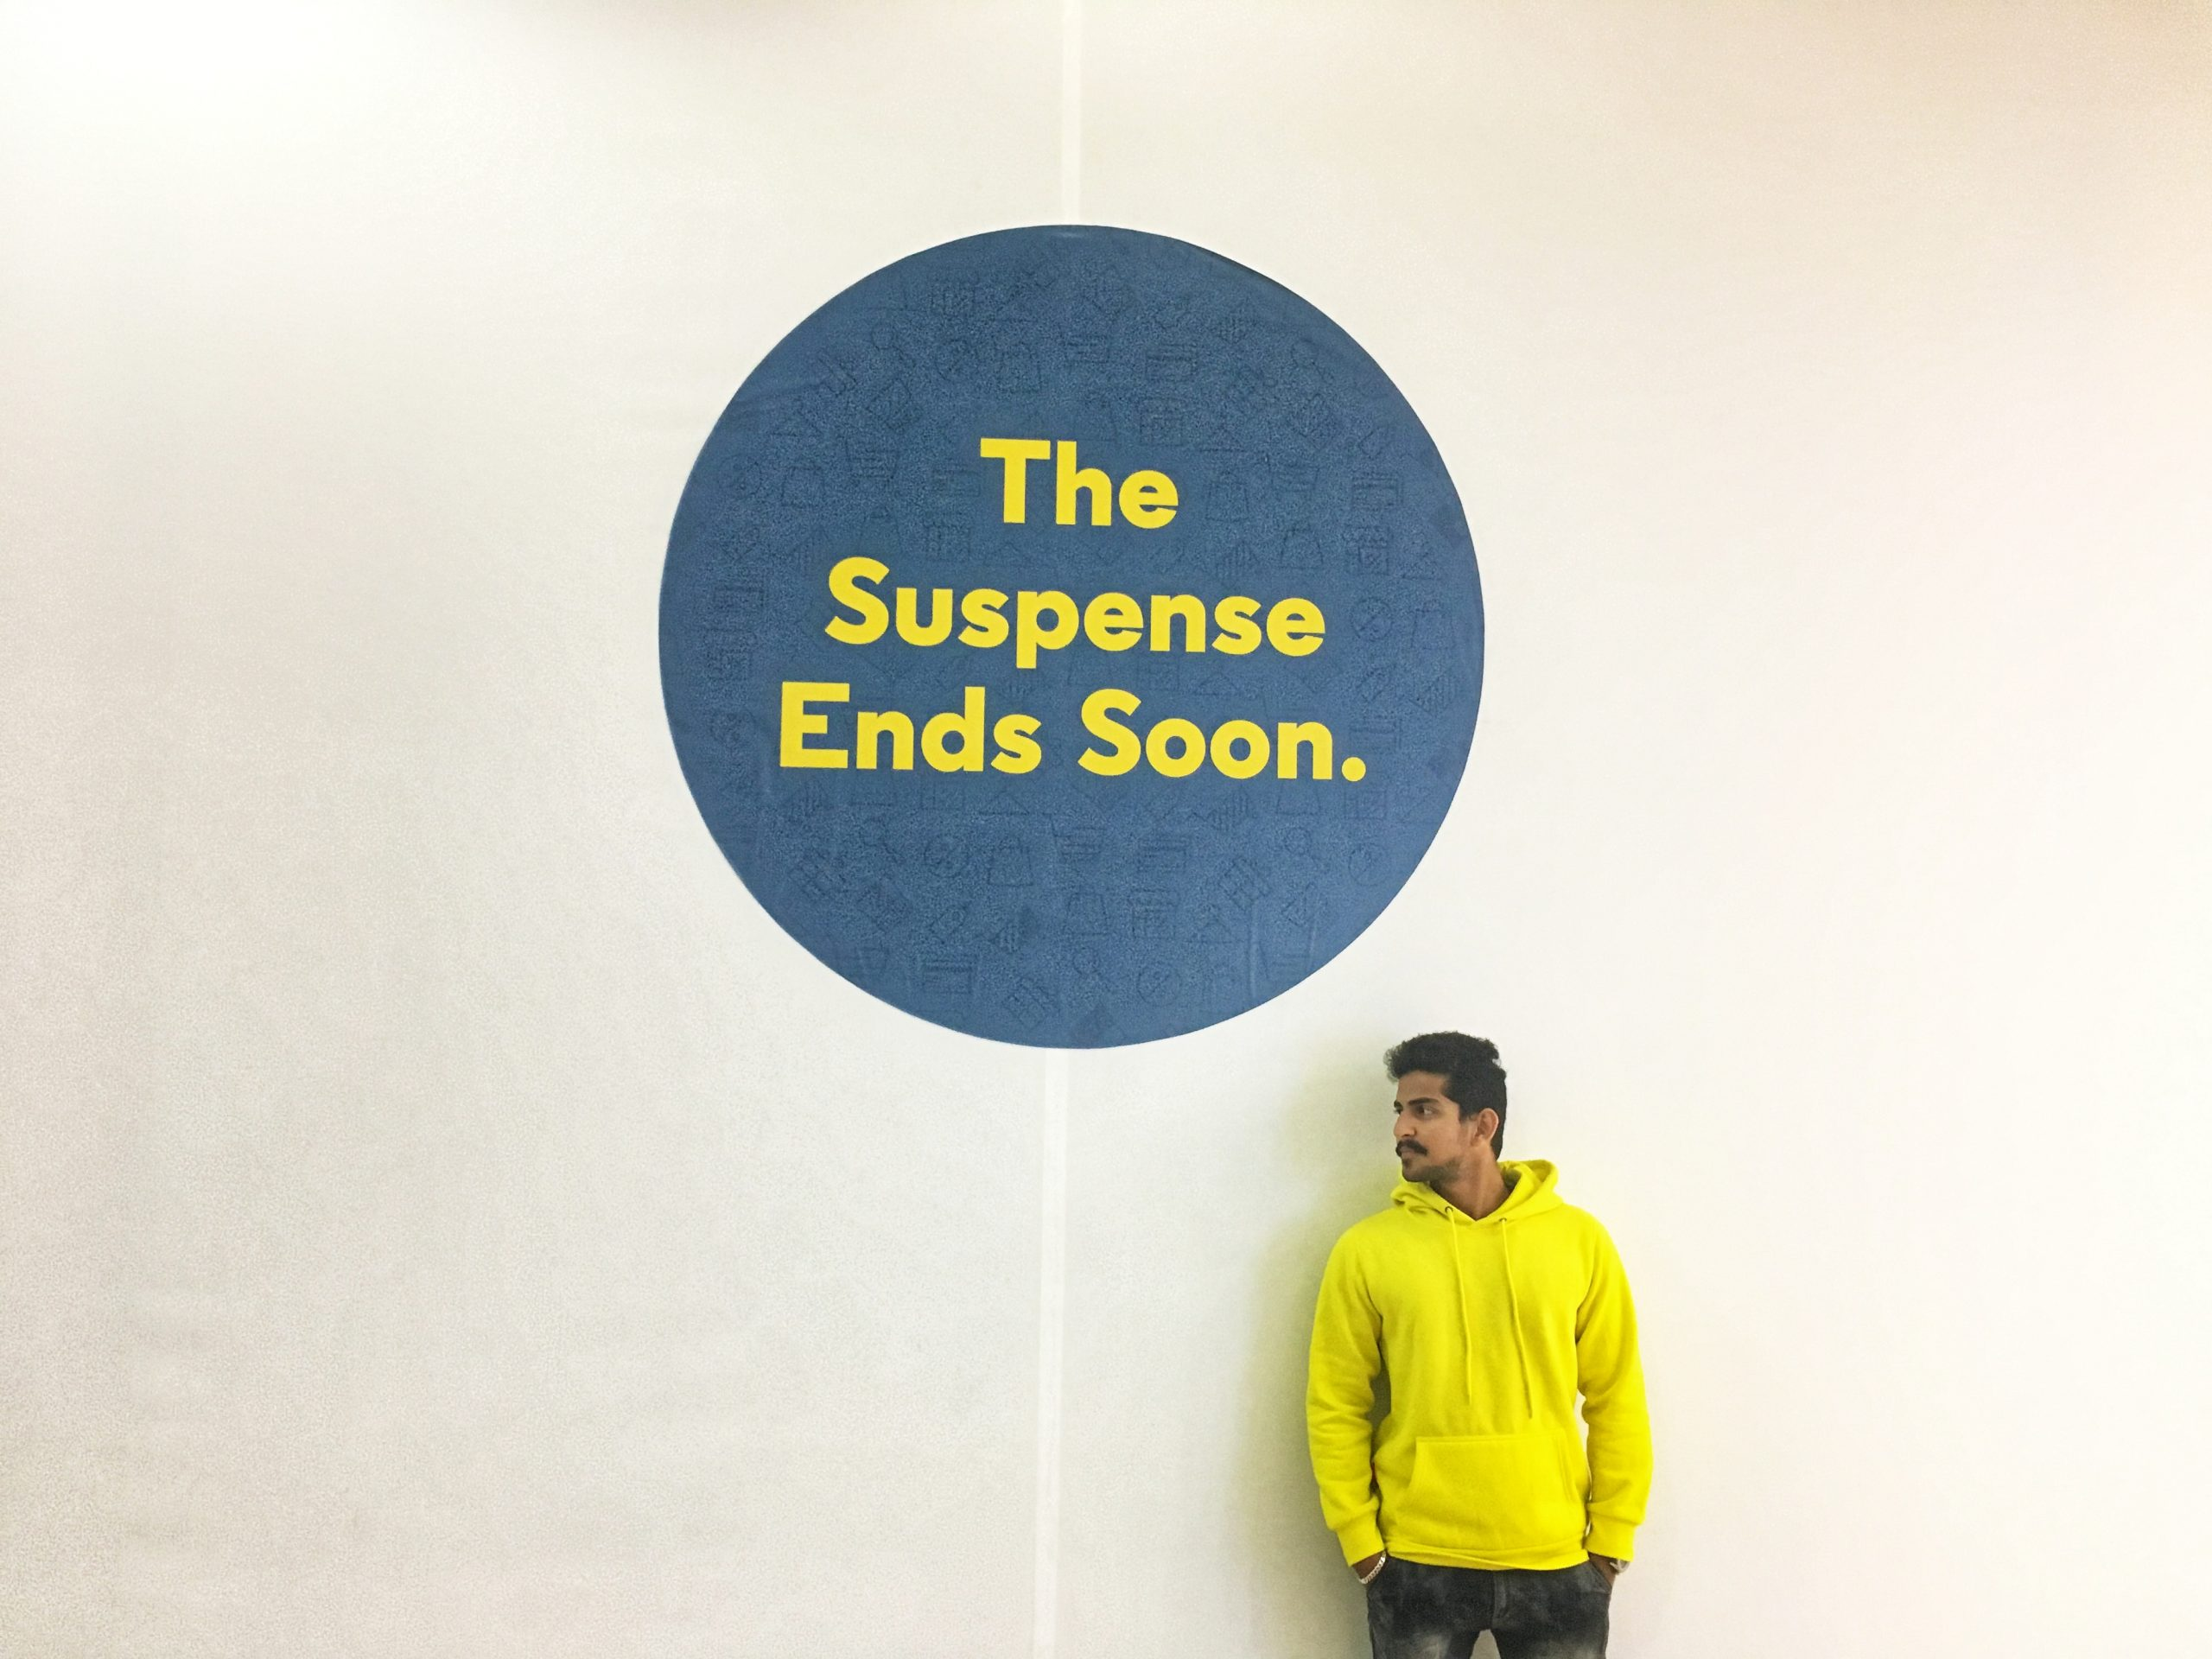 The suspense ends soon concept